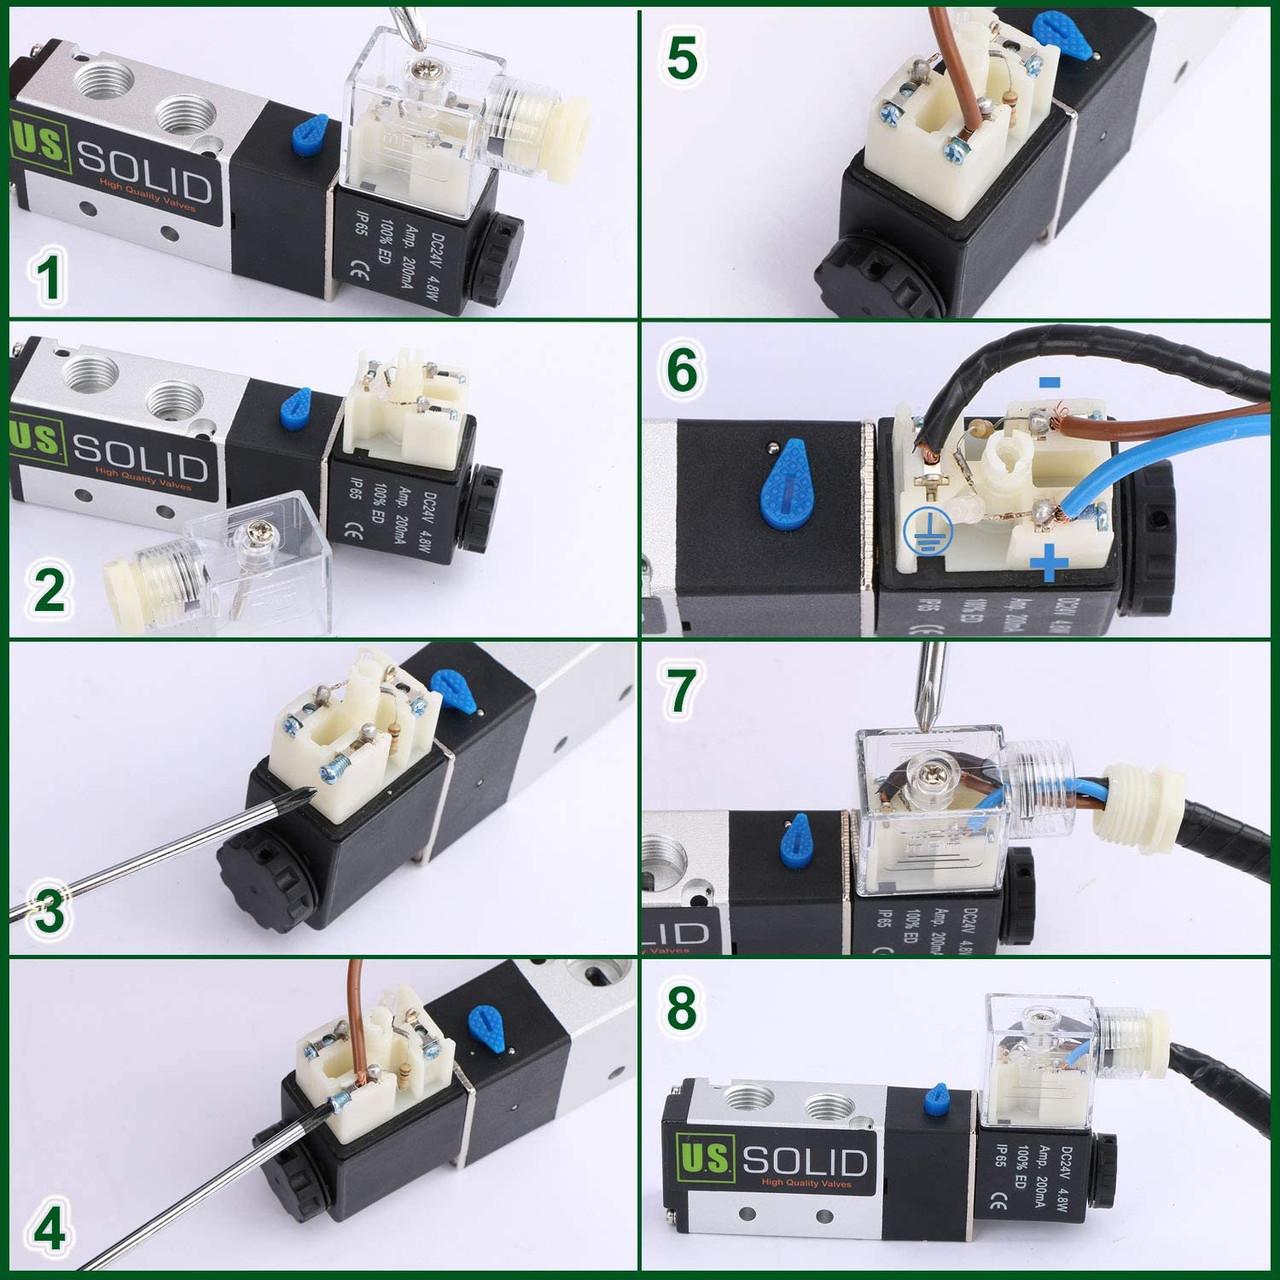 "U.S. Solid 1/8"" NPT 2 Way 2 Position Pneumatic Electric Solenoid Valve AC 110 V"